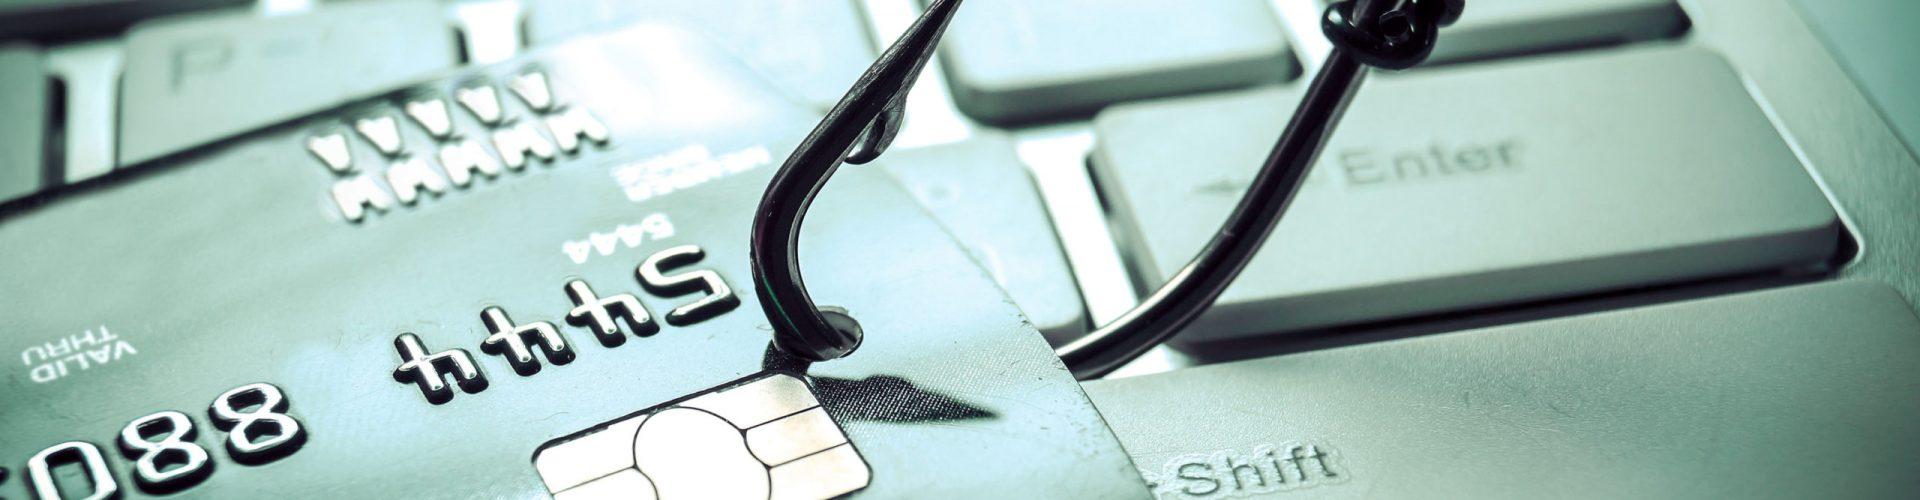 La Ue dichiara guerra al cyber crime